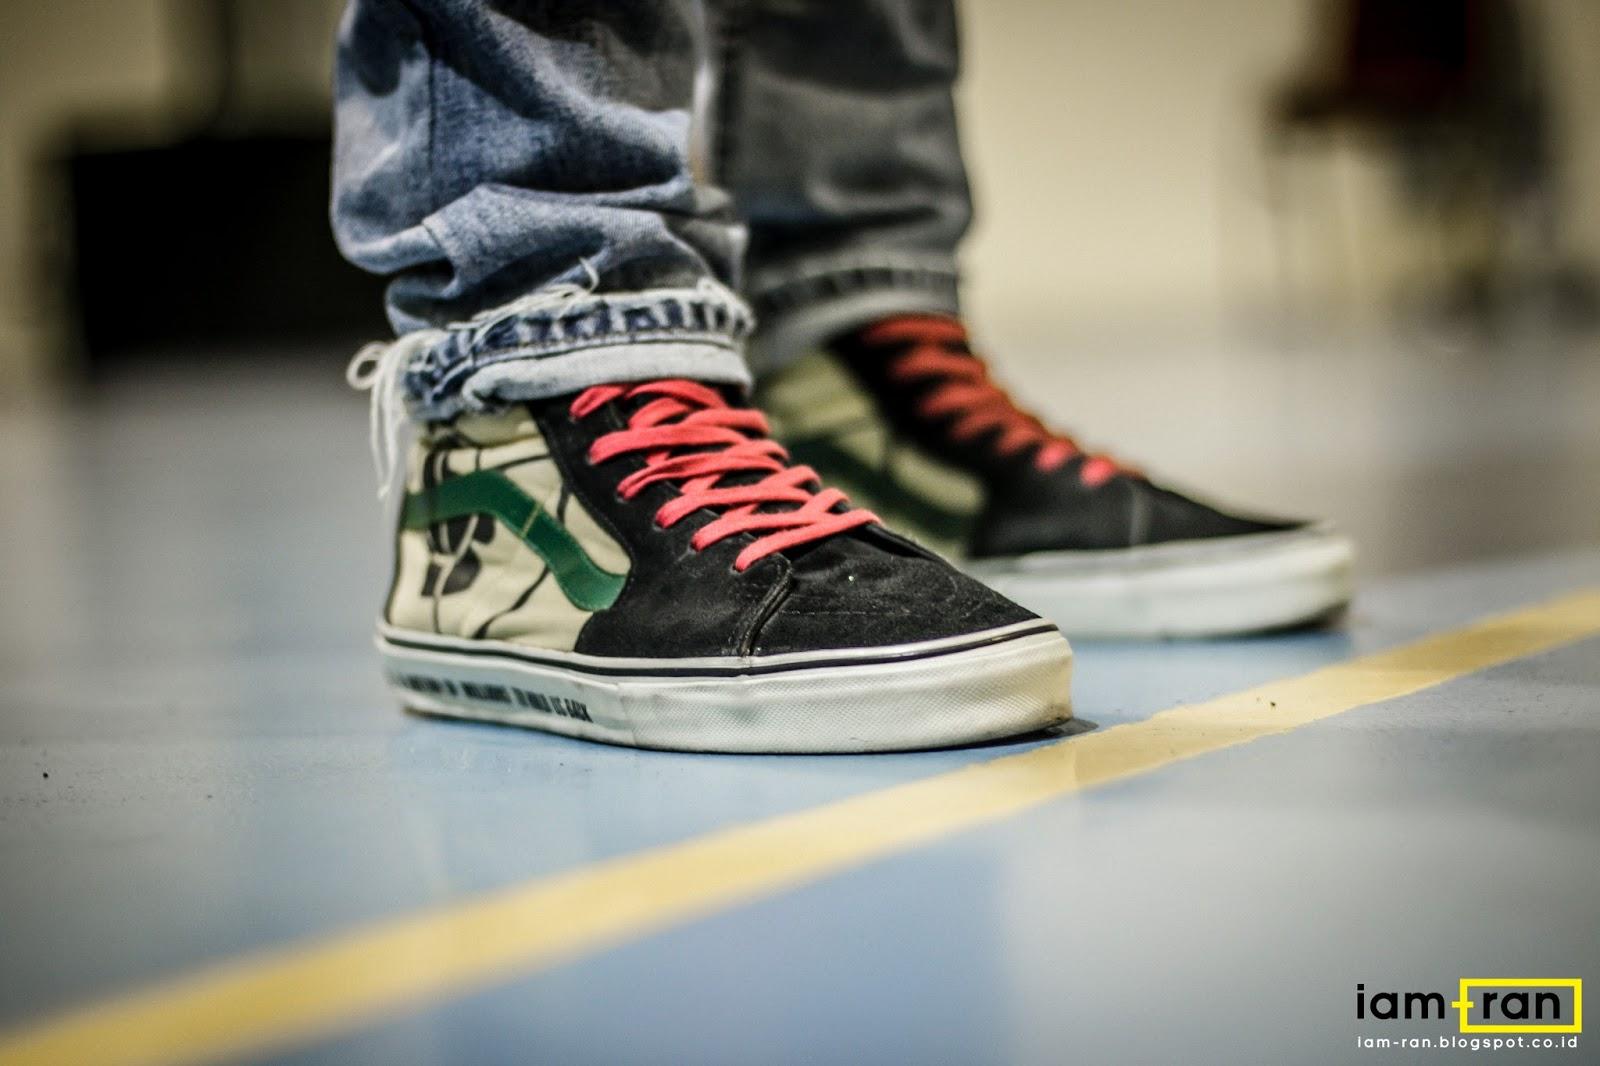 3fad6a70e684a7 ... Photo by iam.ran06 100% authentic 8e64f df6c9  ON FEET Salim - Nike Air  Jordan 3  ON FEET Anggie Raditya - Vans Era X Beams (40th Anniversary) ...